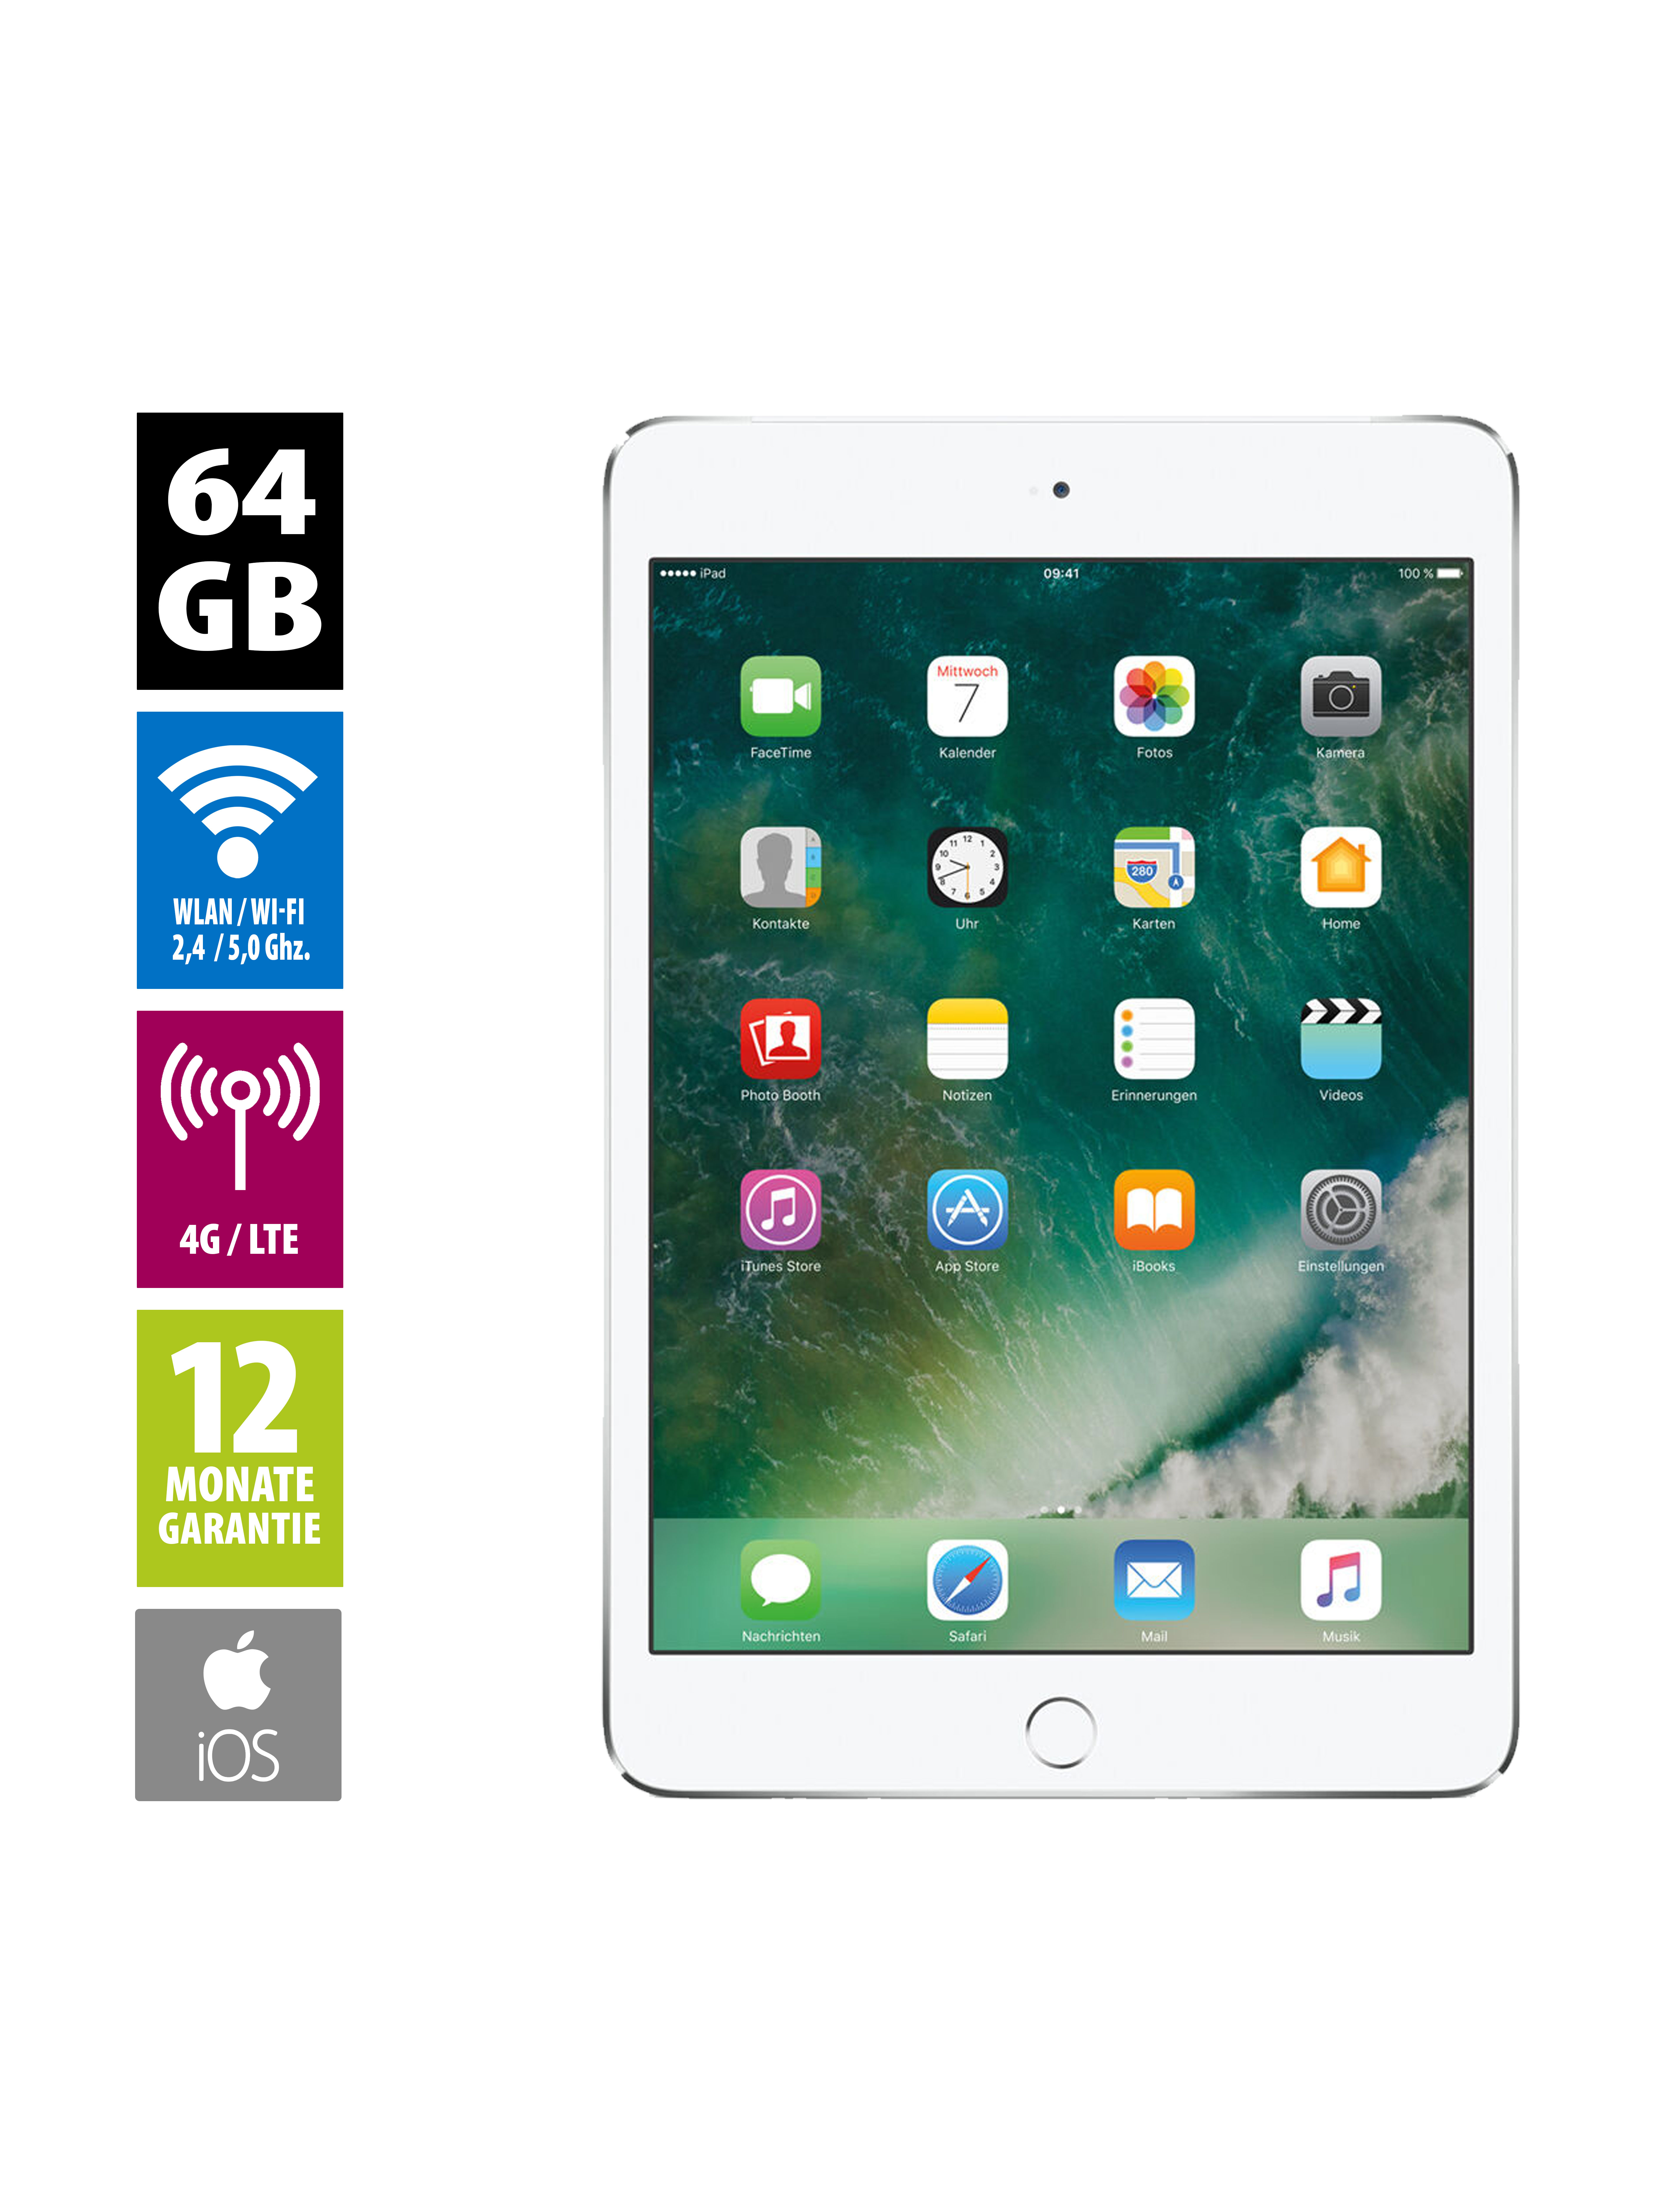 Flot Apple iPad mini 4 Wi-Fi + Cellular (64GB) - silver   AfB social VG-47